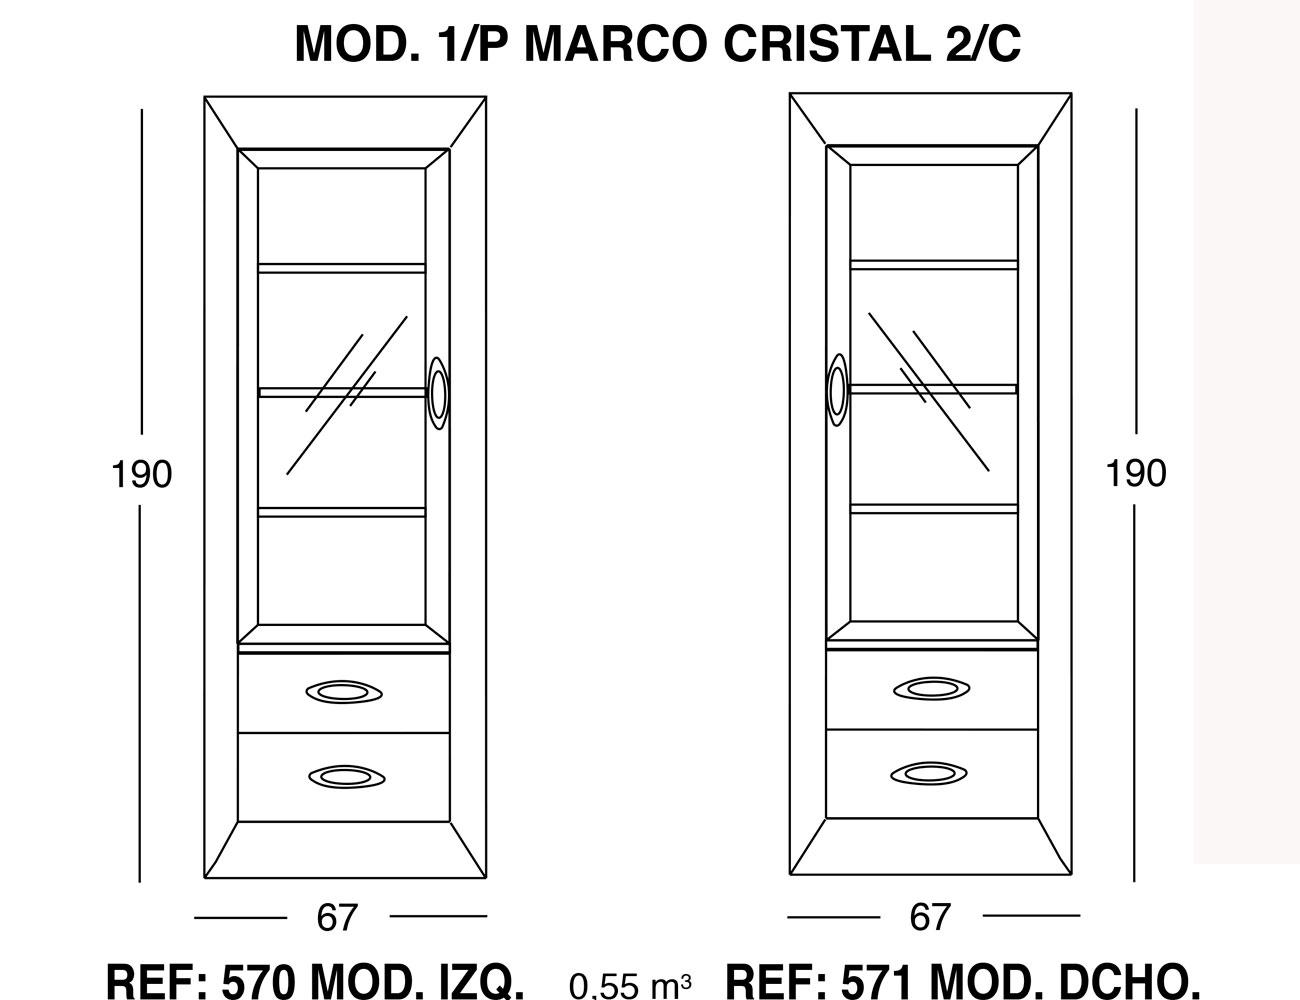 Modulo 1 puerta marco cristal 2 cajones1